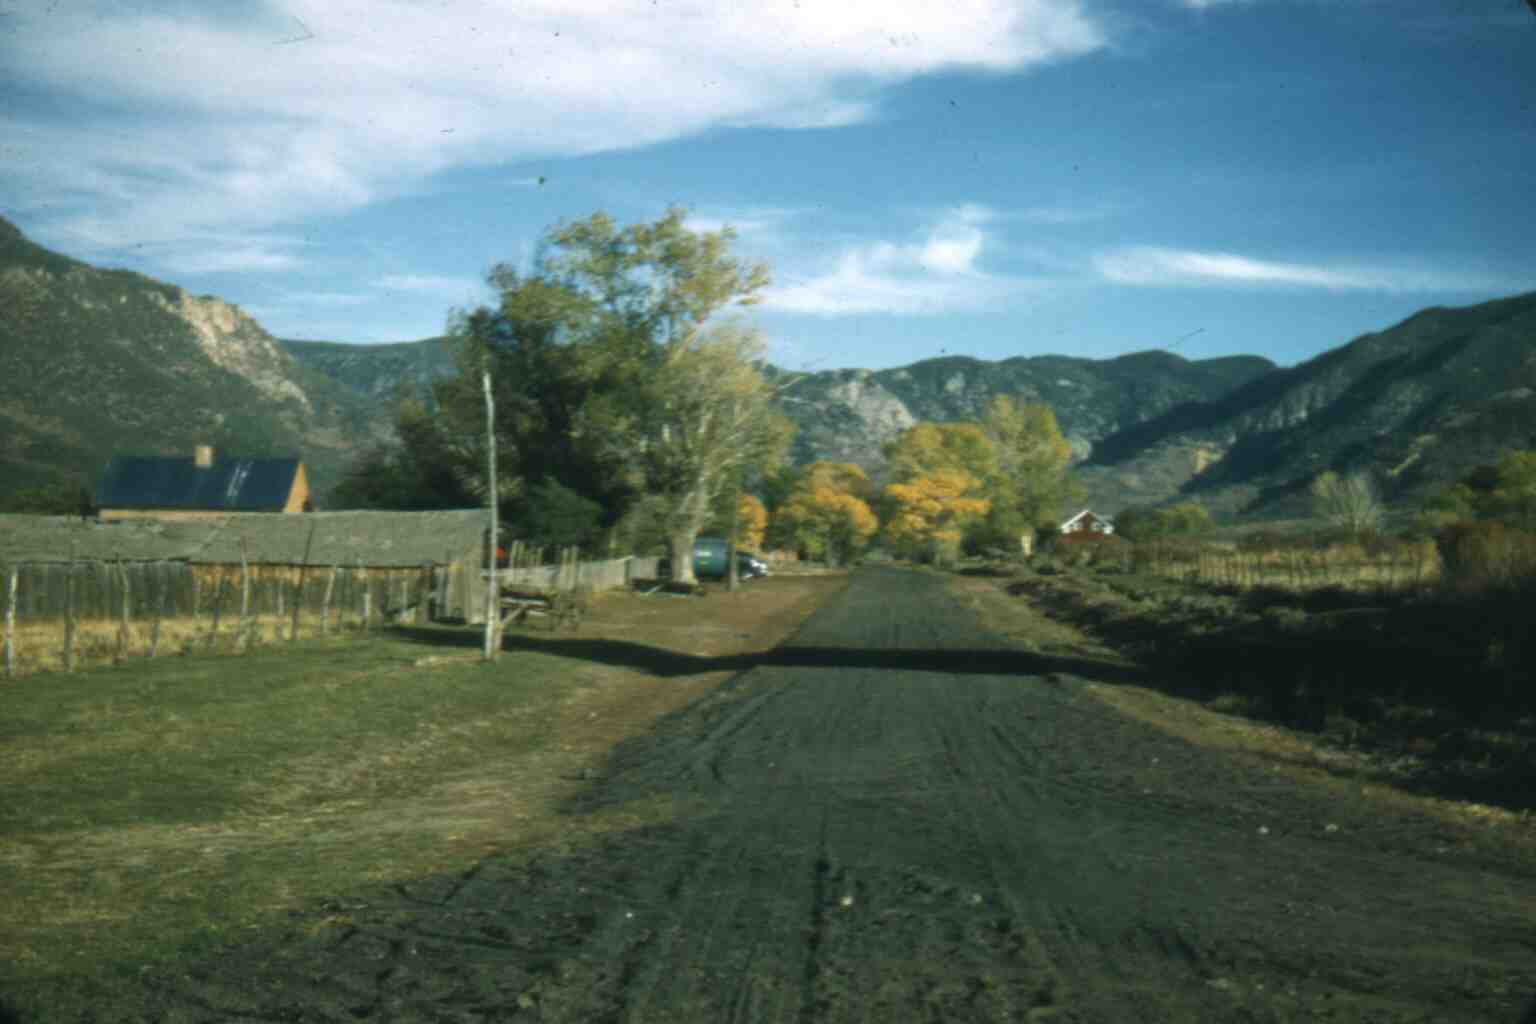 PVHAC-Pine Valley Historical Advisory Committee